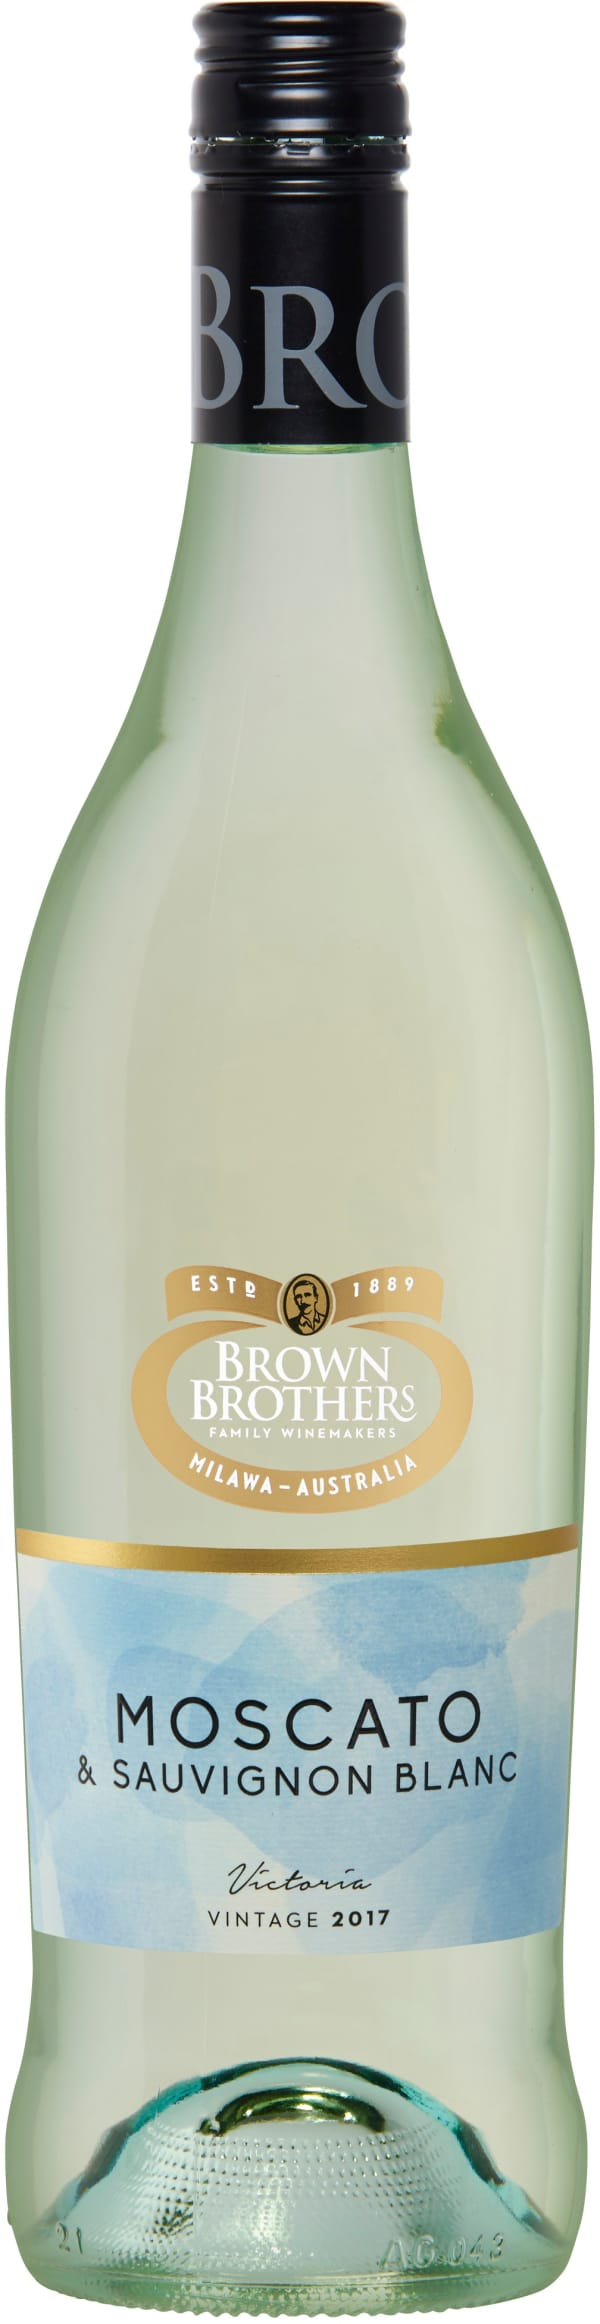 Brown Brothers Moscato Sauvignon Blanc 2017